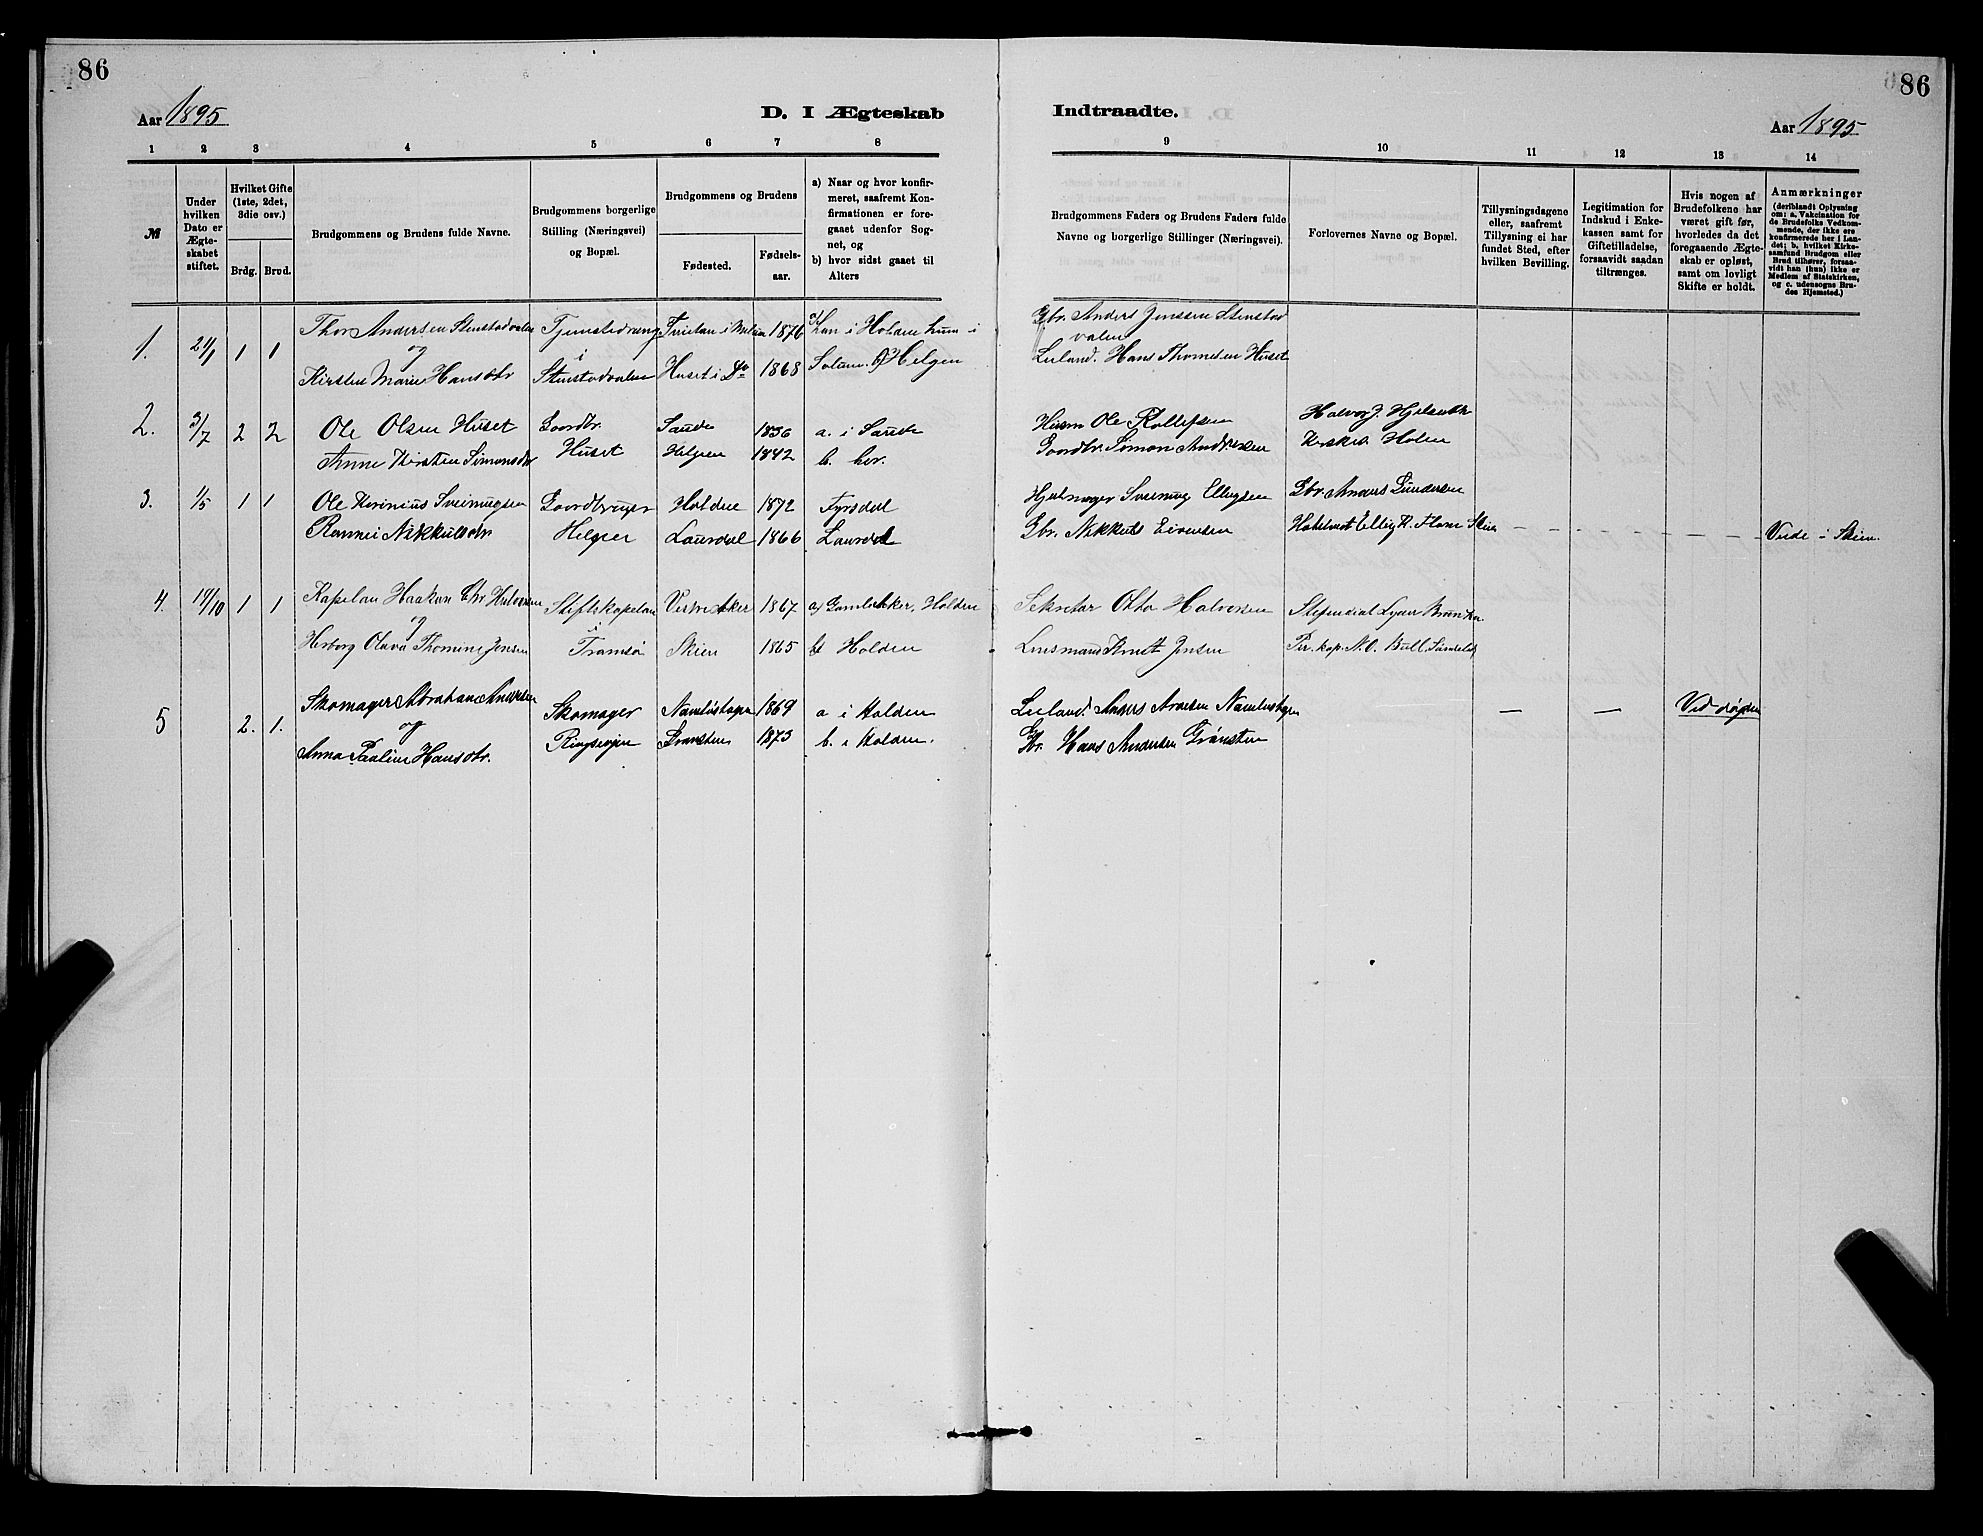 SAKO, Holla kirkebøker, G/Gb/L0001: Klokkerbok nr. II 1, 1882-1897, s. 86